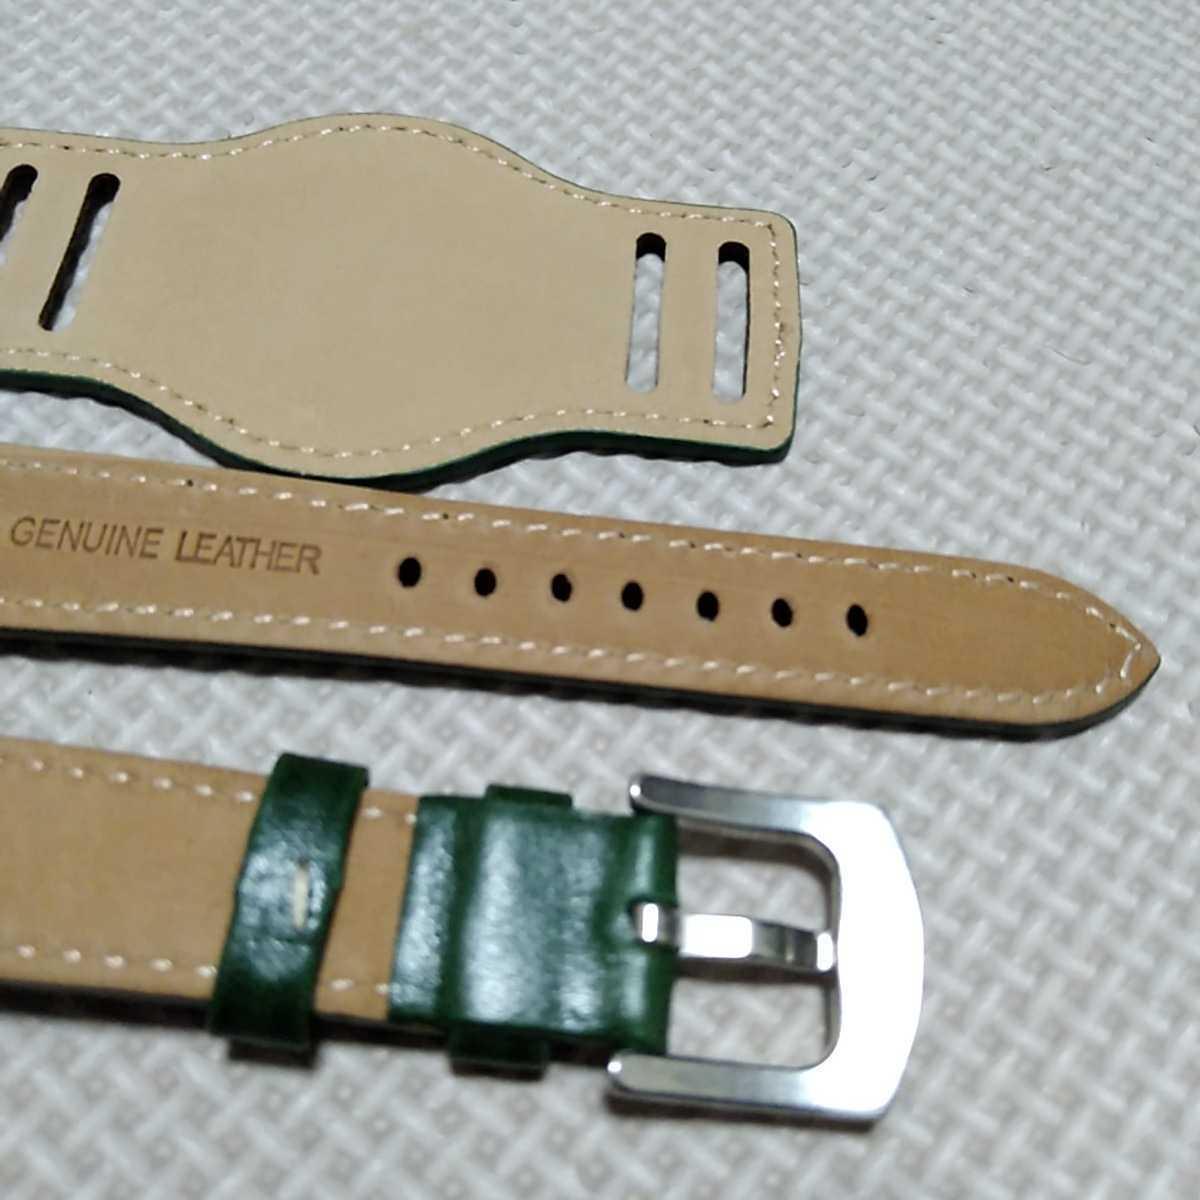 No52 ブンド BUND 本革レザーベルト 腕時計ベルト 交換用ストラップ グリーン 18mm 未使用 高品質 ドイツパイロット 空軍_画像6